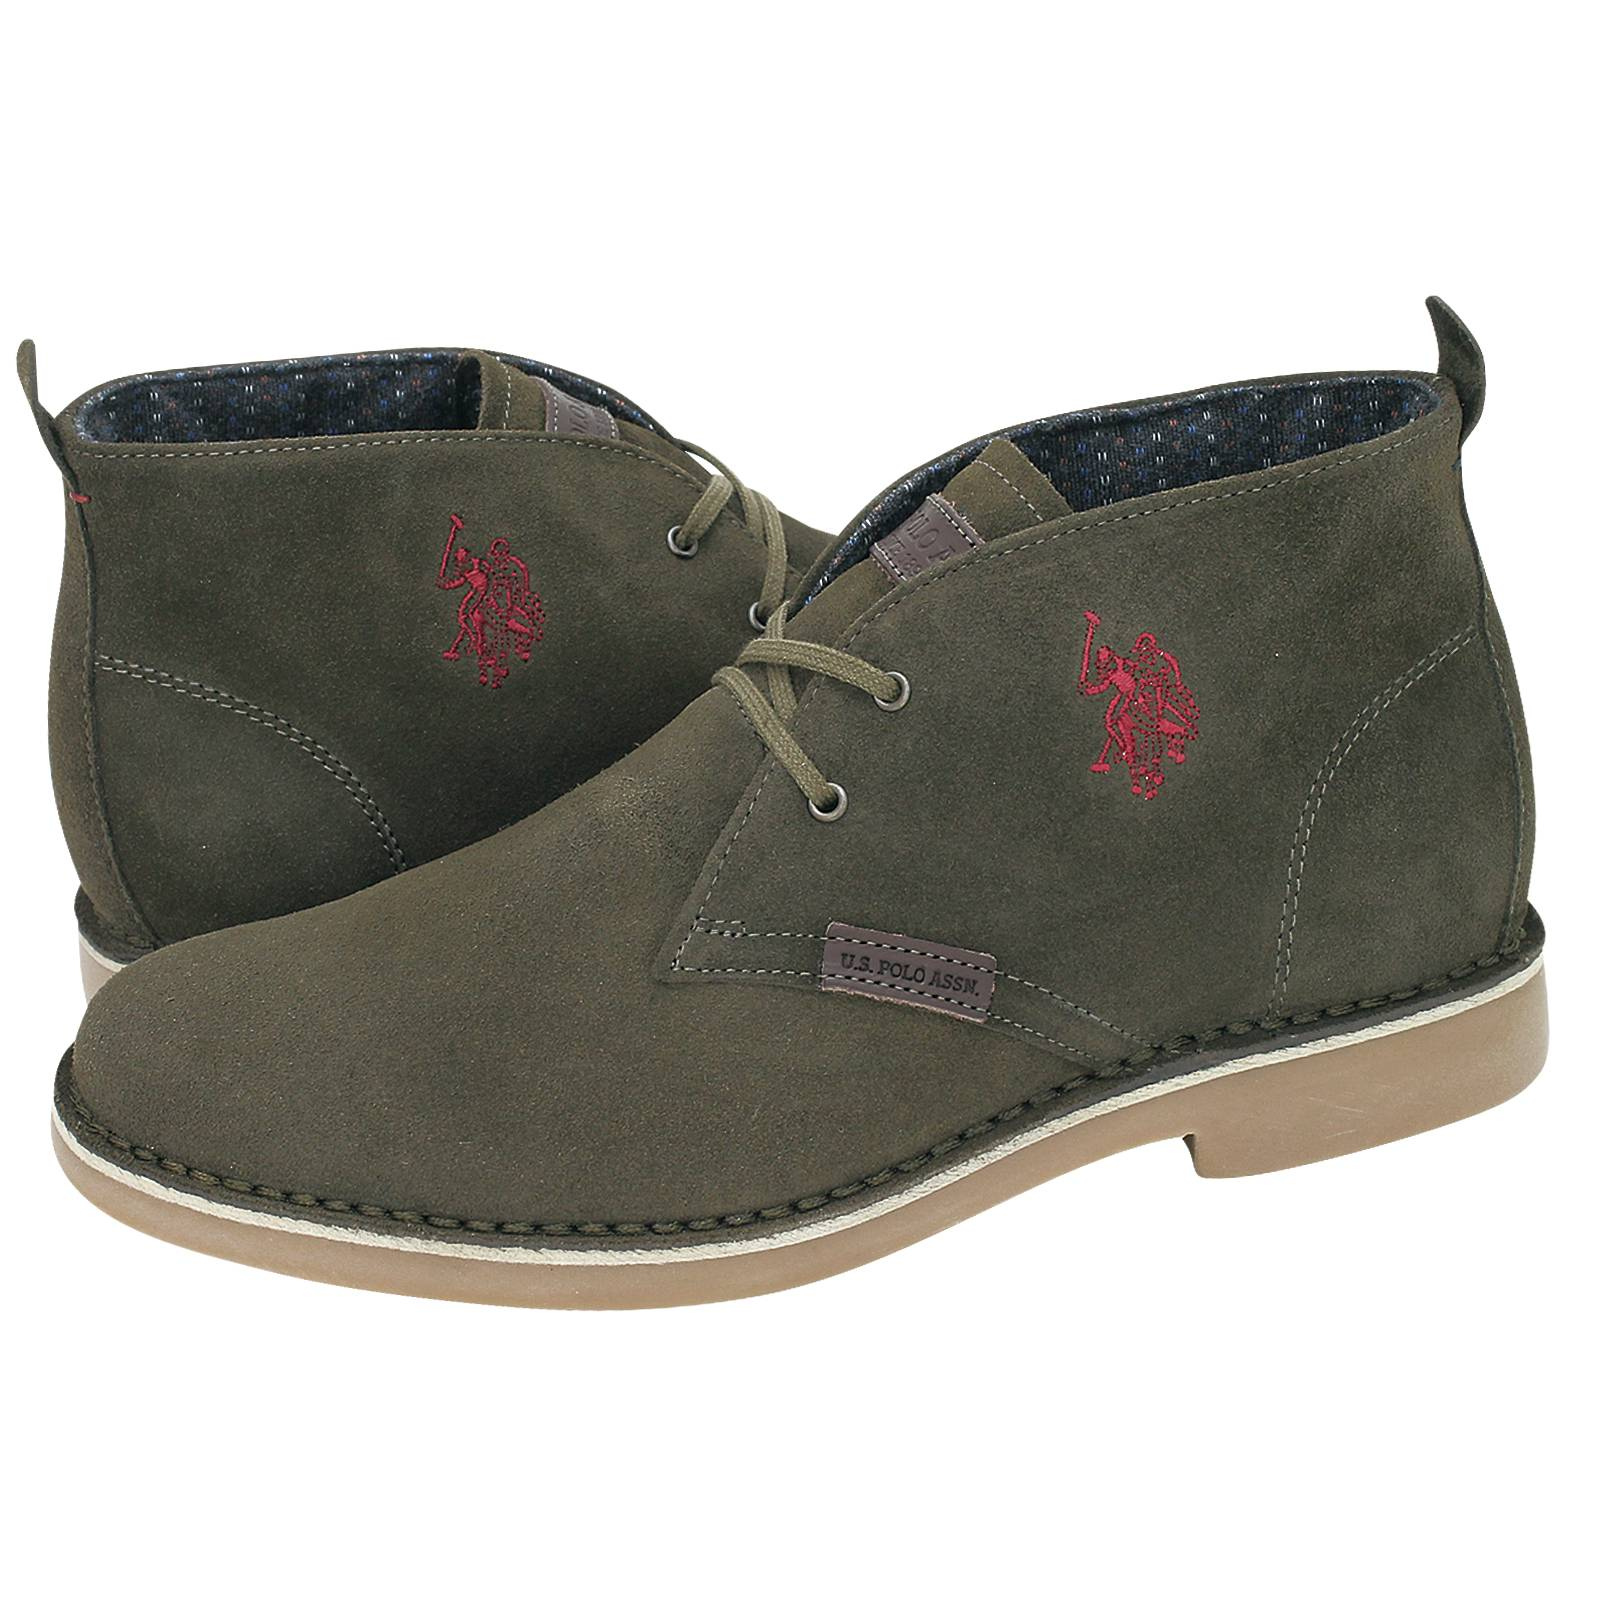 fc87b155b3efda Amadeus 13 - U.S. Polo ASSN Men's low boots made of suede - Gianna ...